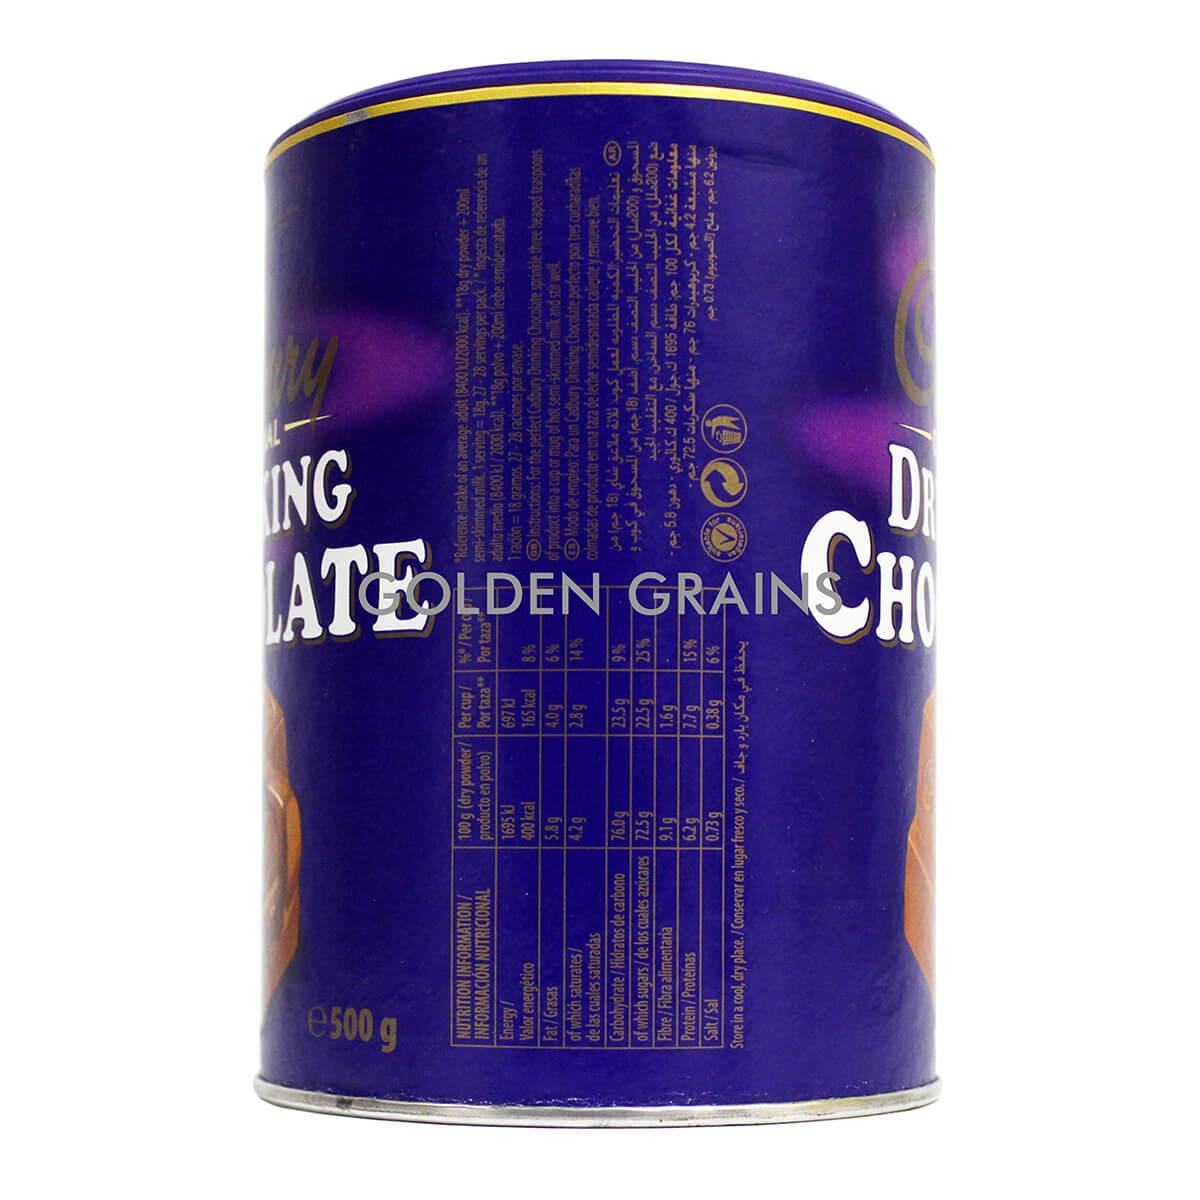 Golden Grains Cadbury - Drinking Chocolate 500G - Back.jpg